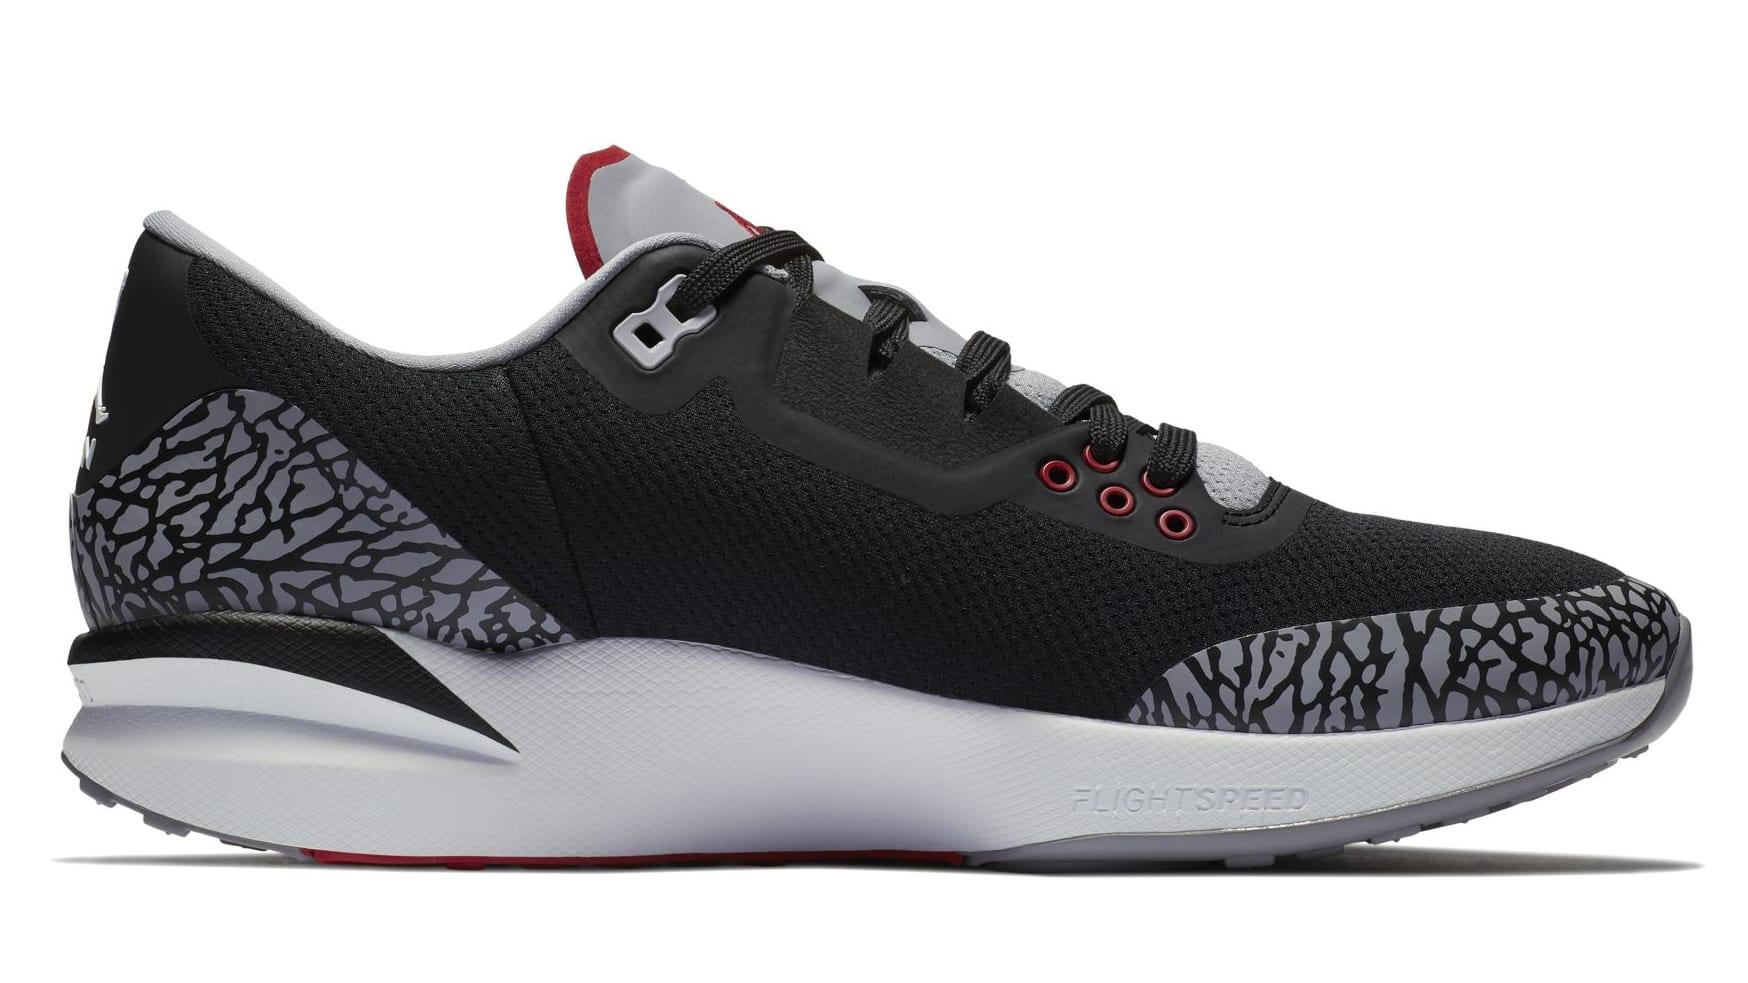 Jordan Zoom Tenacity 88 'Black/Cement' (Medial)